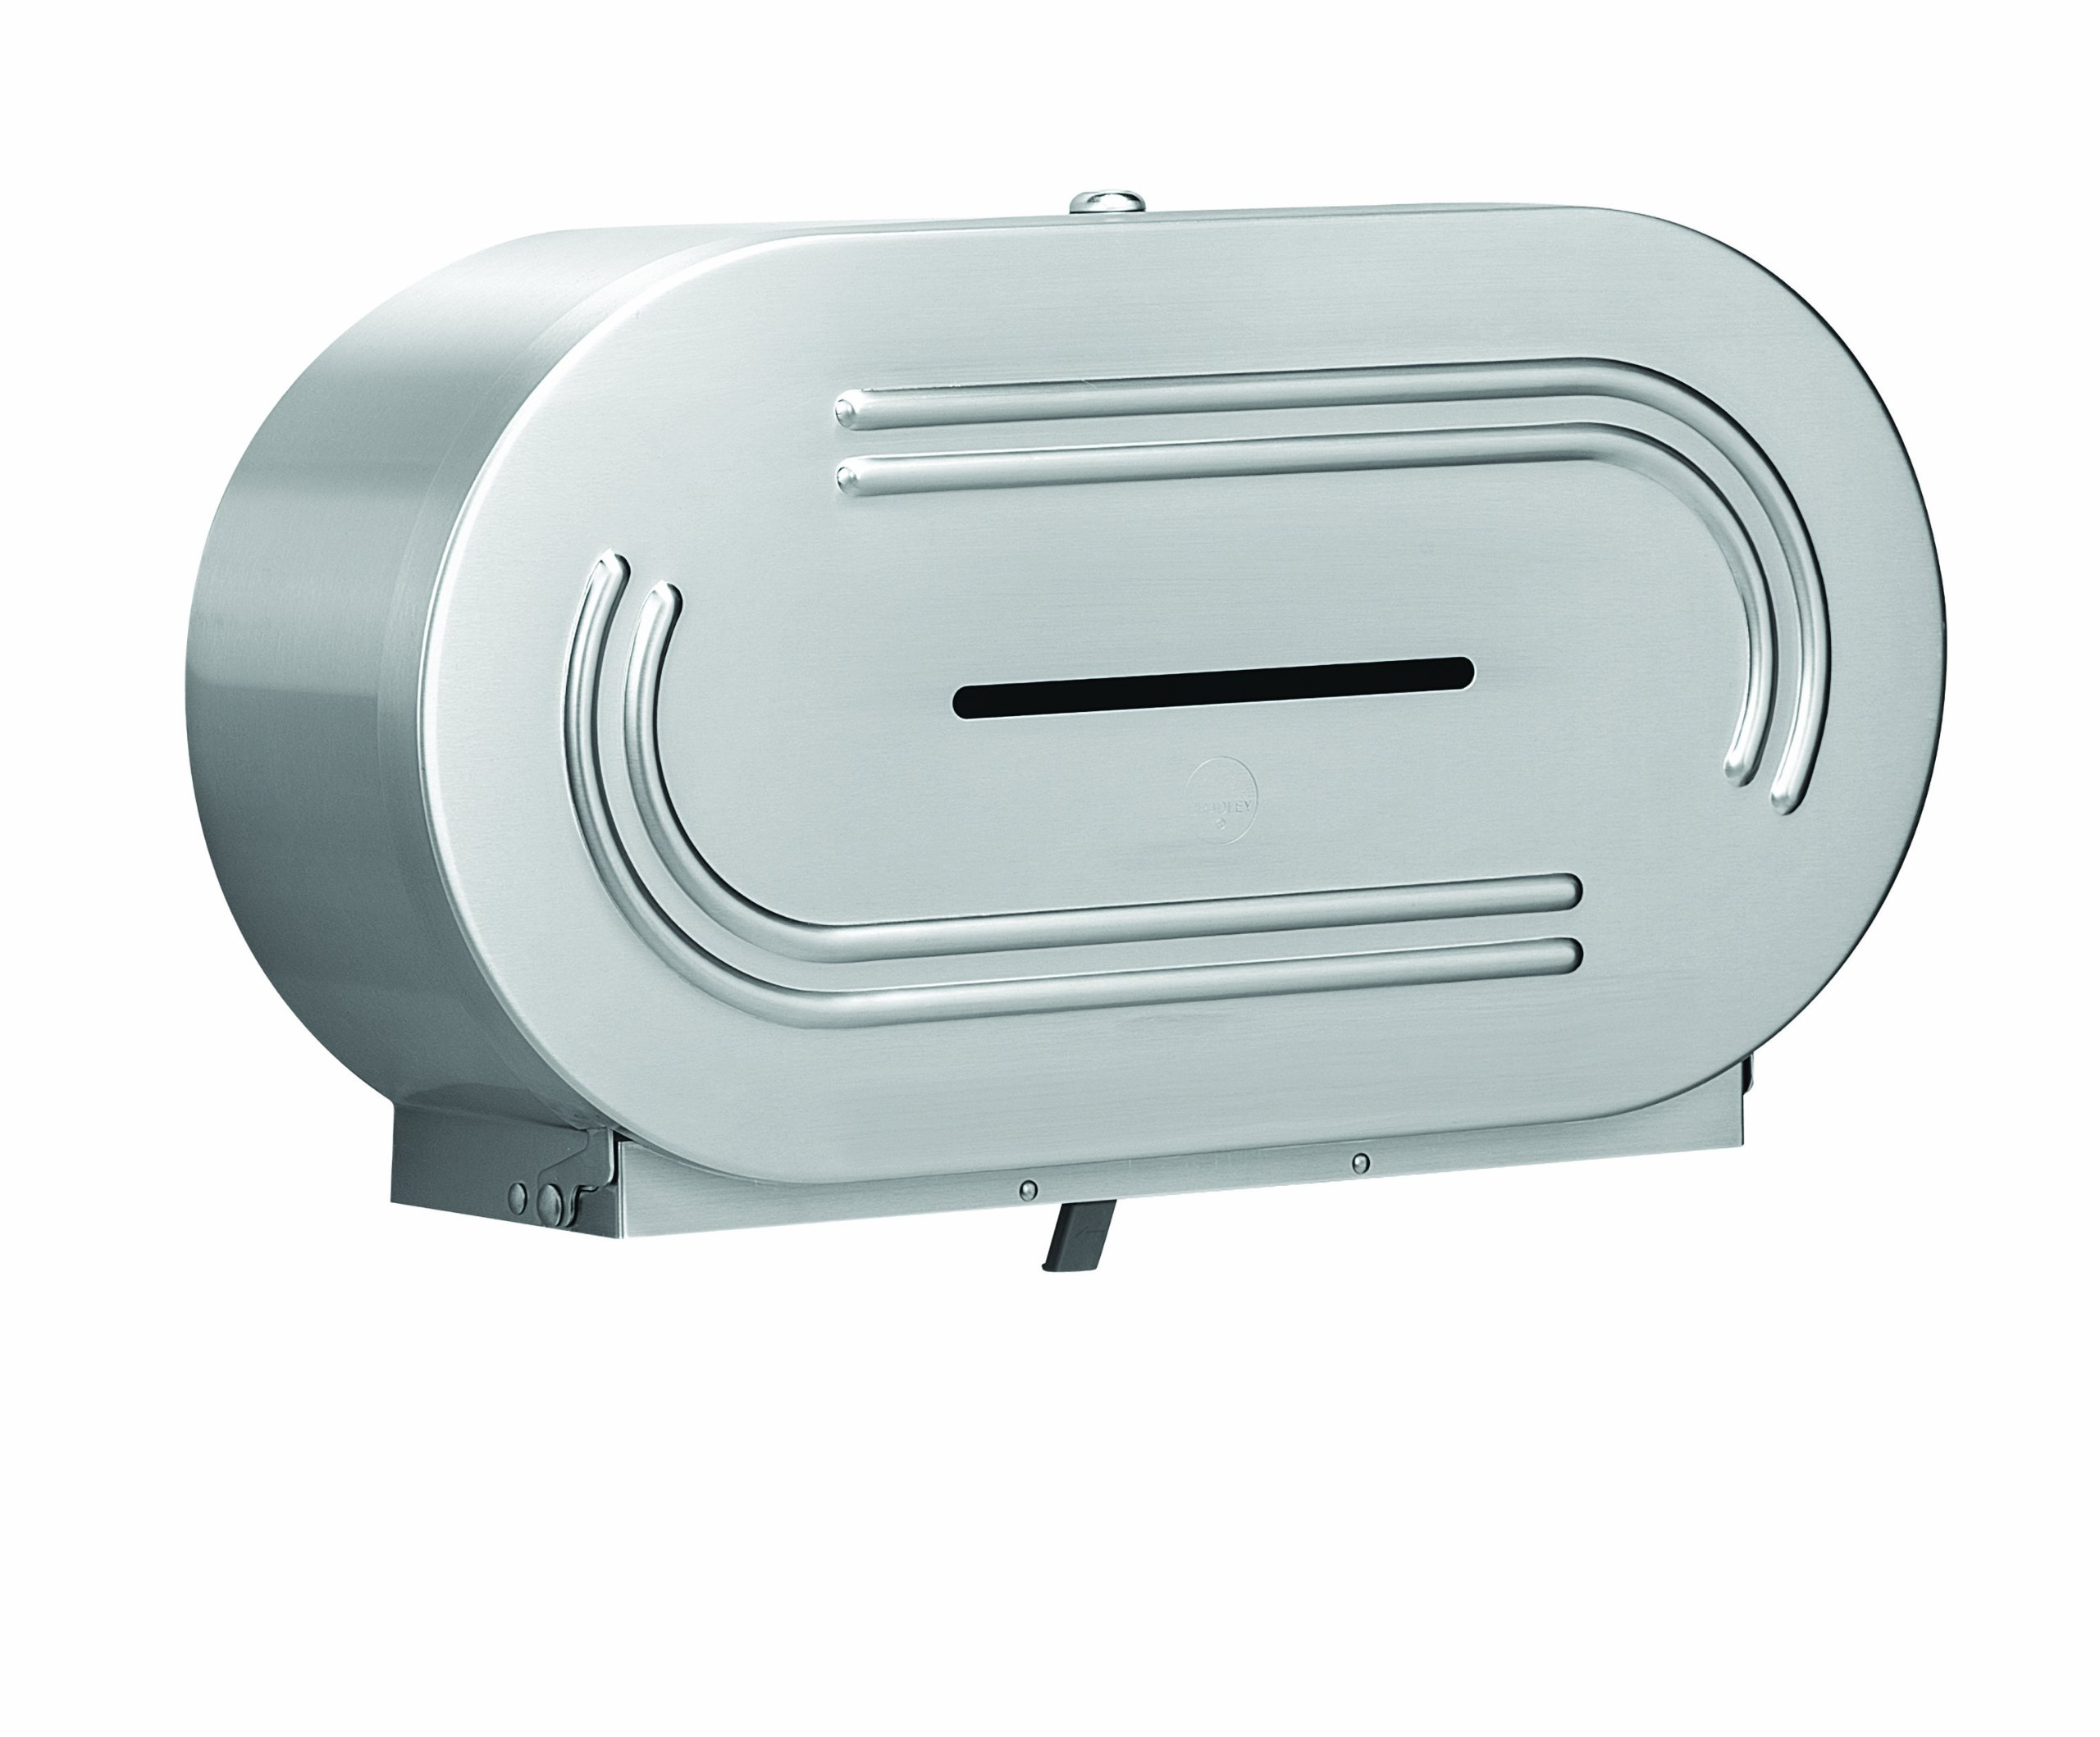 Bradley 5425-000000 18 Gauge Stainless Steel Jumbo Dual Roll Toilet Tissue Dispenser, 20-9/16'' Width x 11-3/8'' Height x 6'' Depth by Bradley